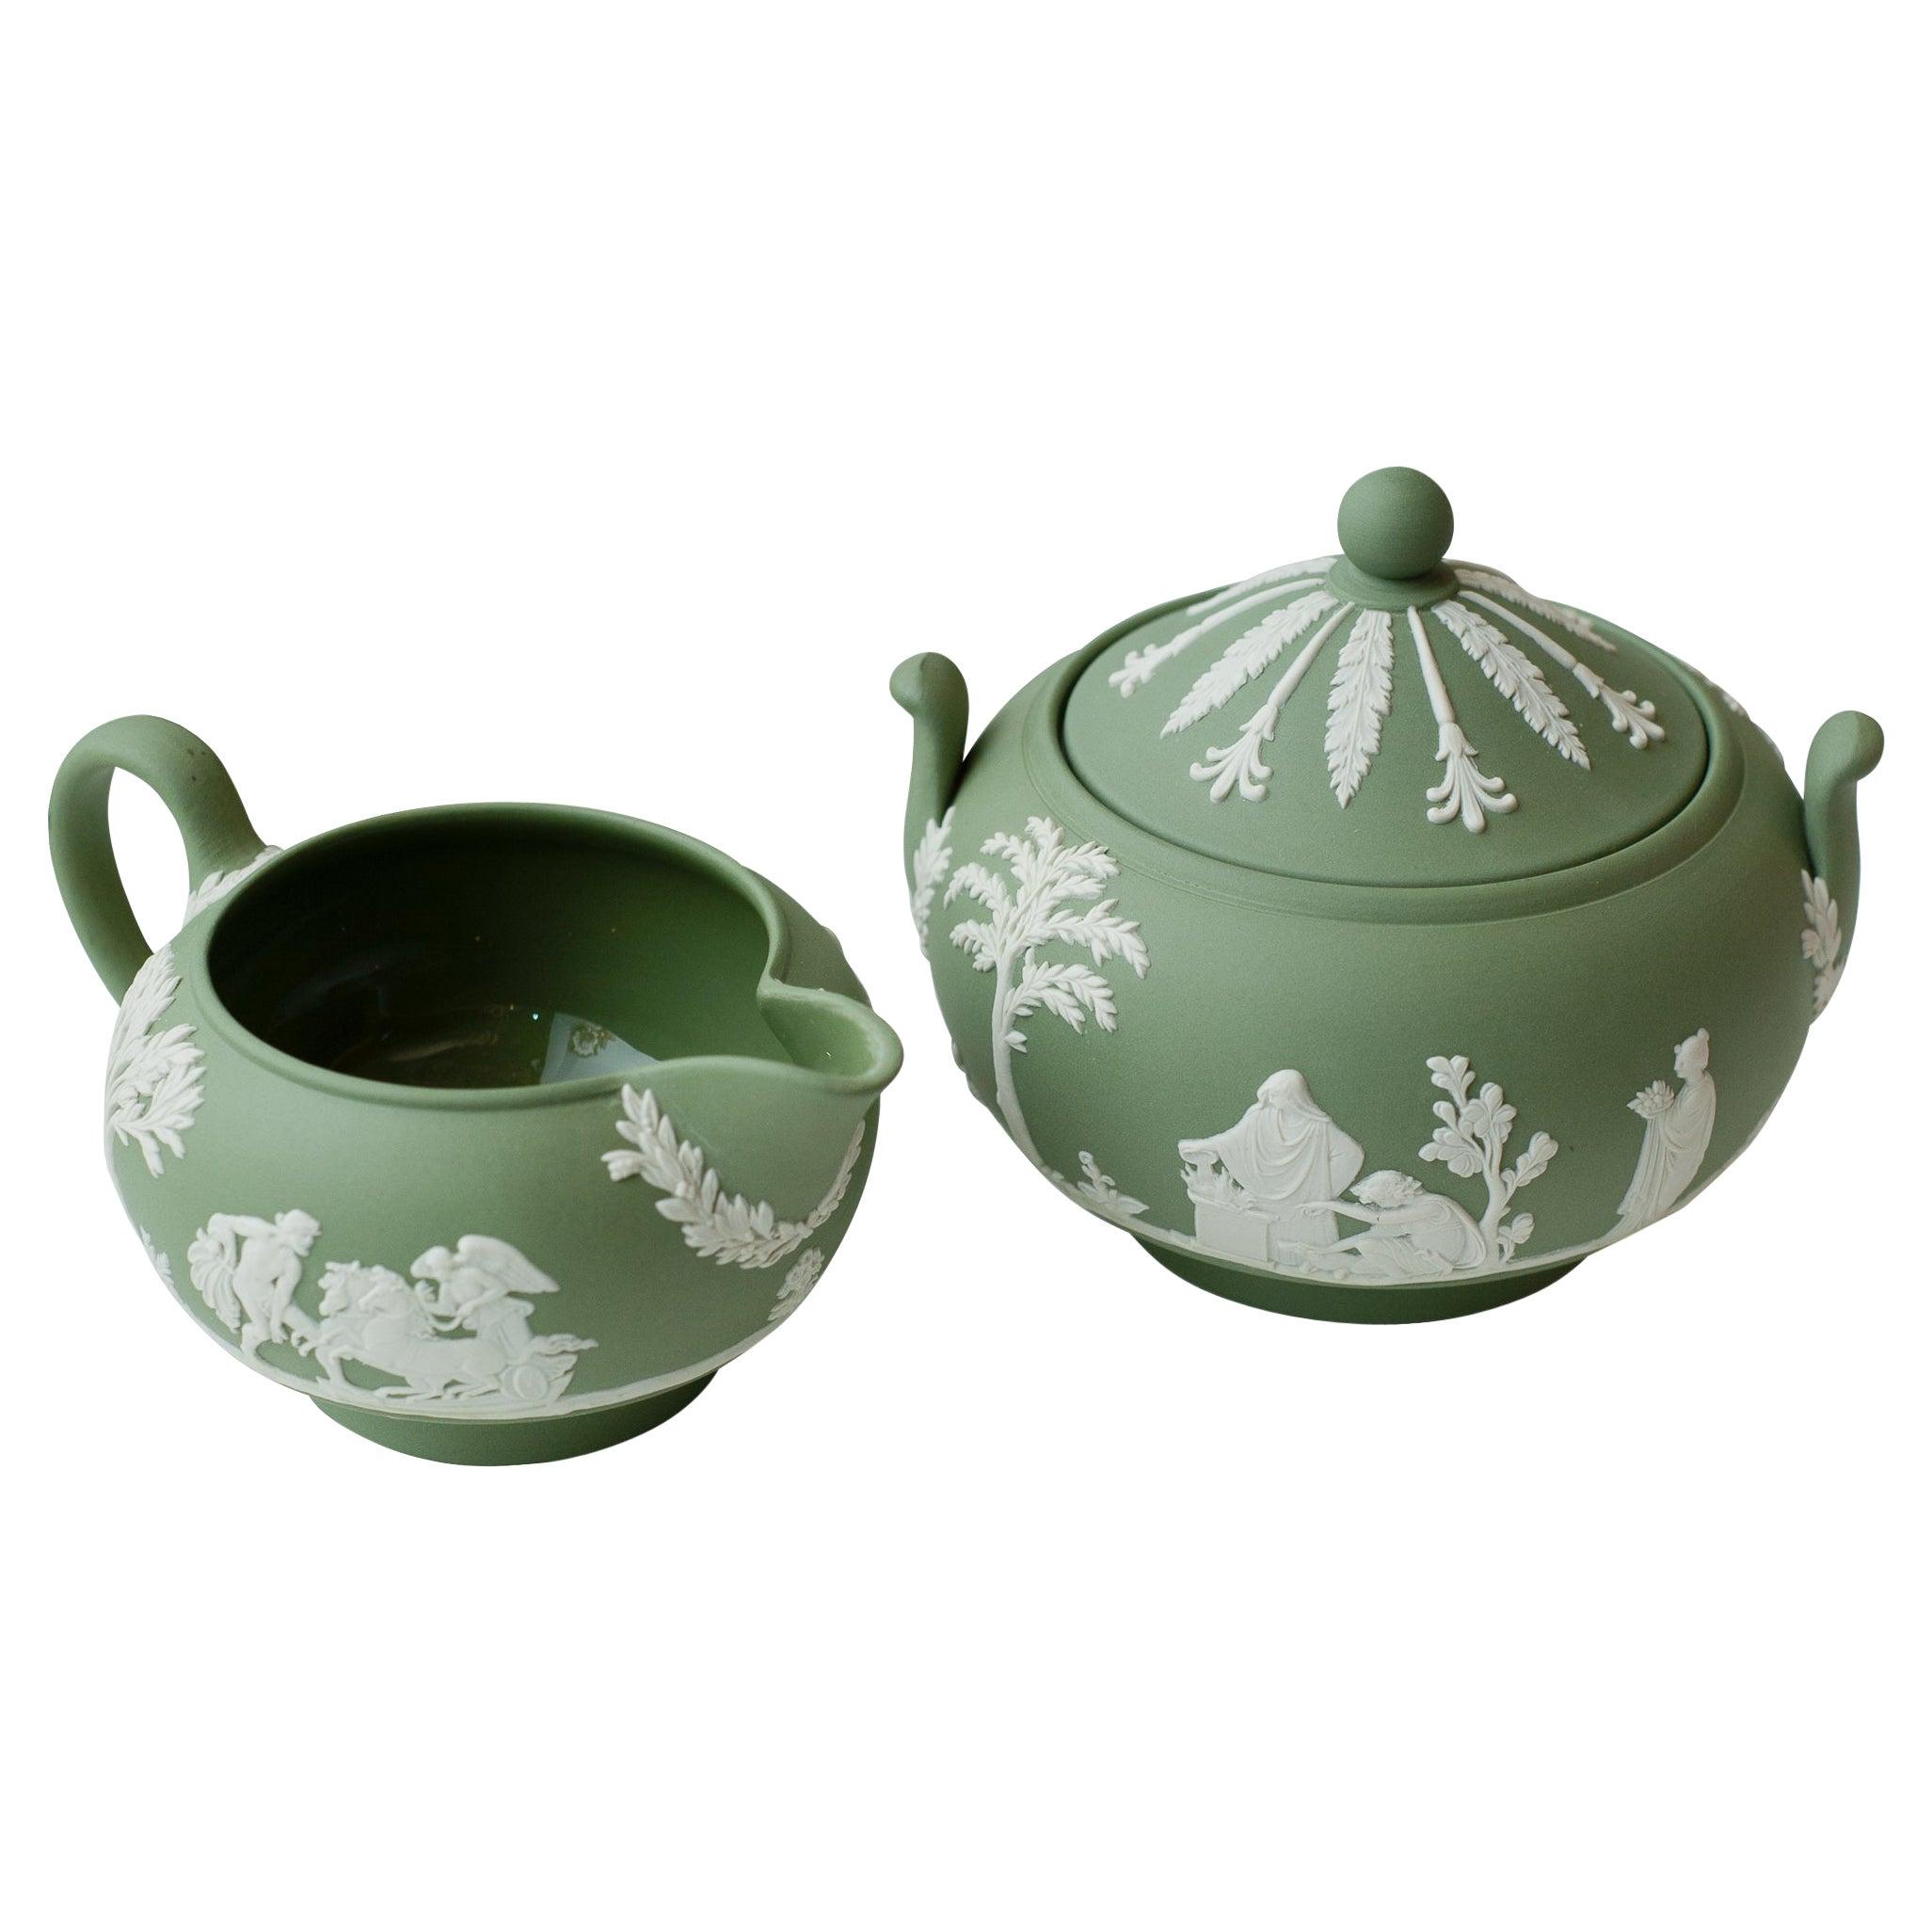 Antique Set of Sage Green Wedgwood Jasperware Sugar Bowl and Creamer